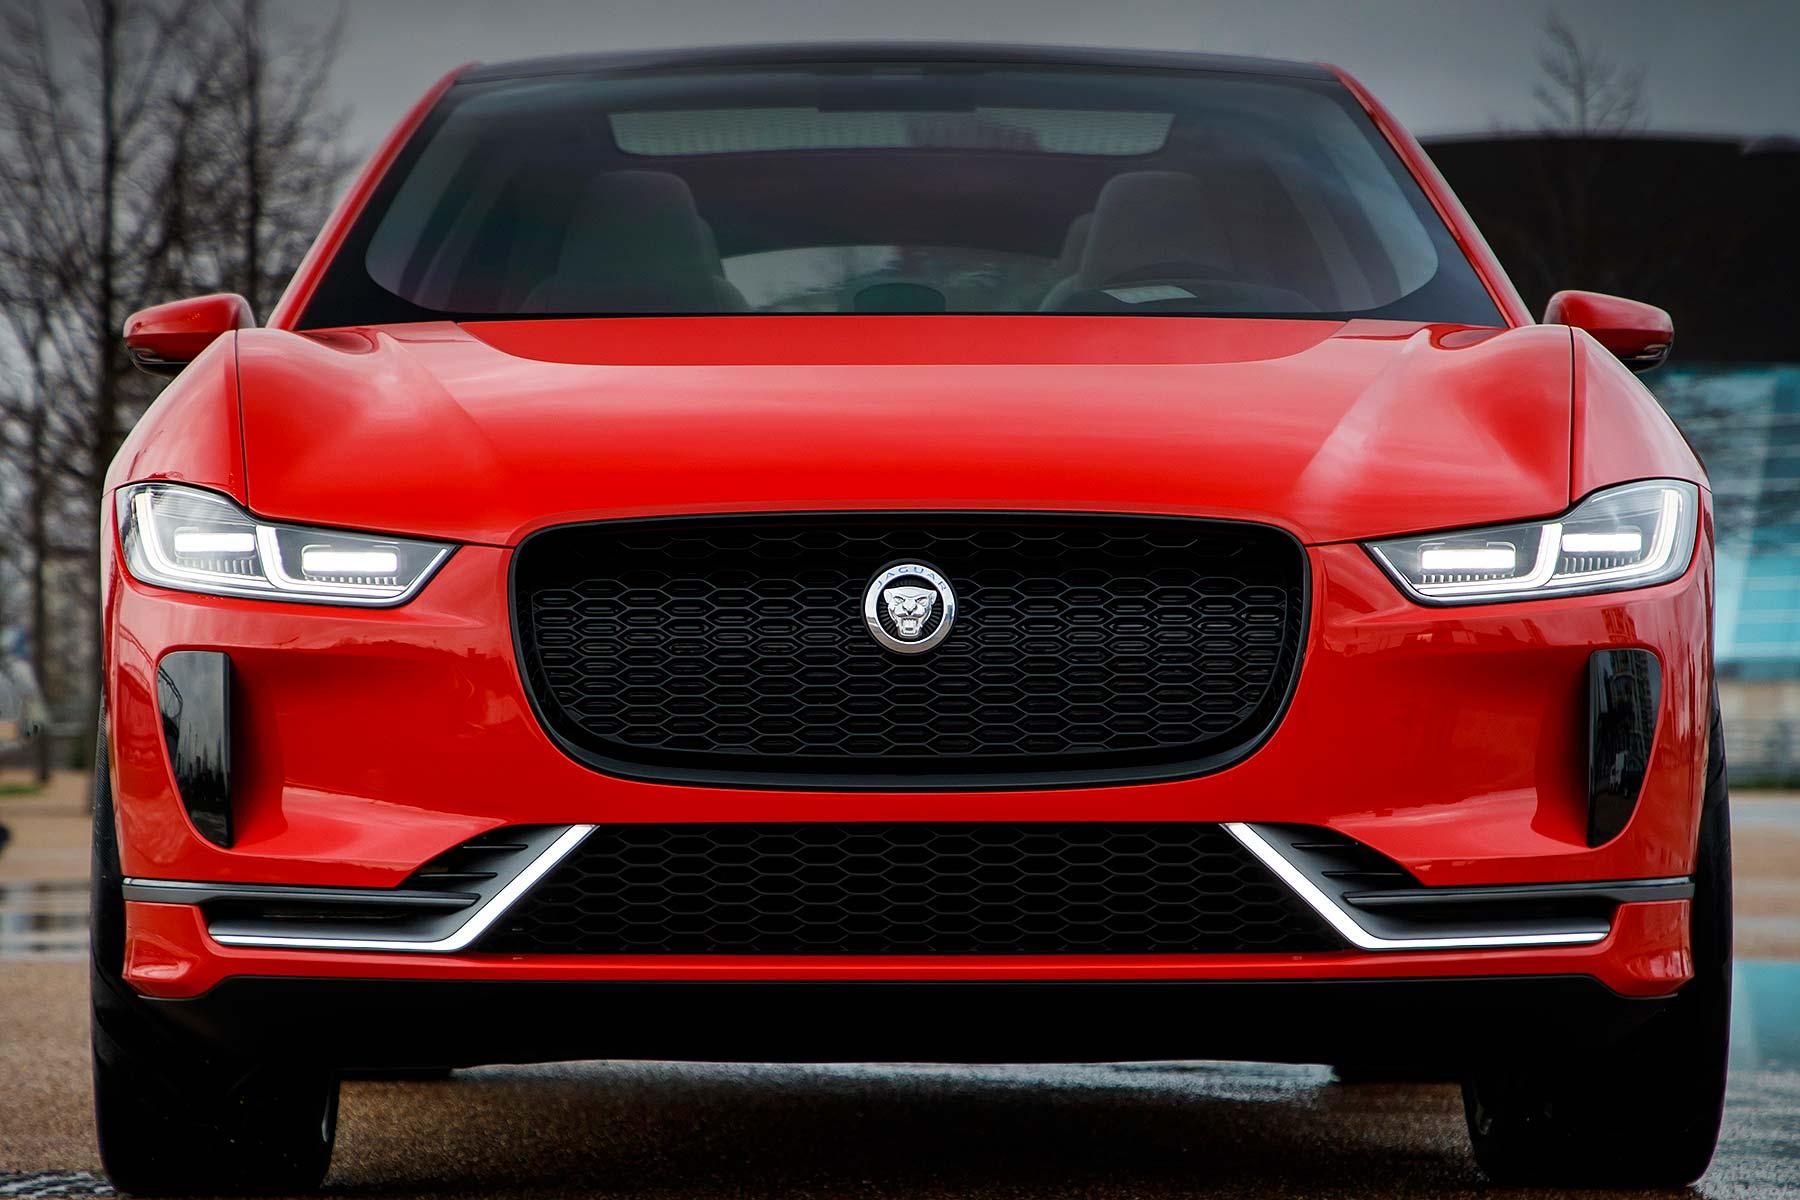 Futuristic British Electric Cars Win Top Awards